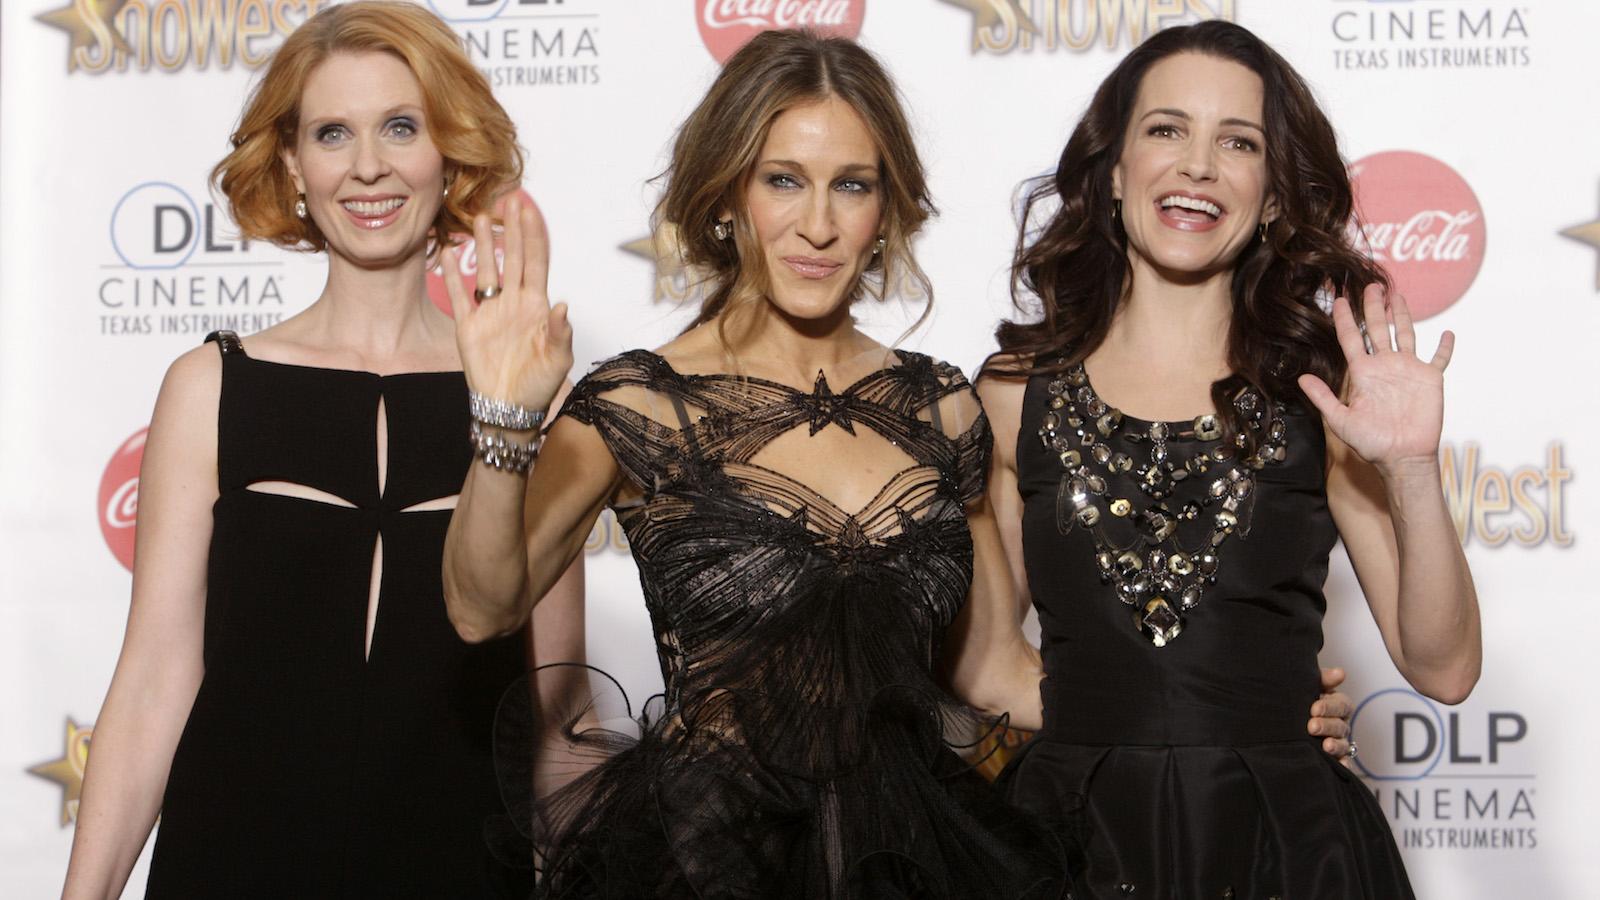 Cynthia Nixon, Sarah Jessica Parker and Kristin Davis, pose during the awards ceremony of ShoWest.